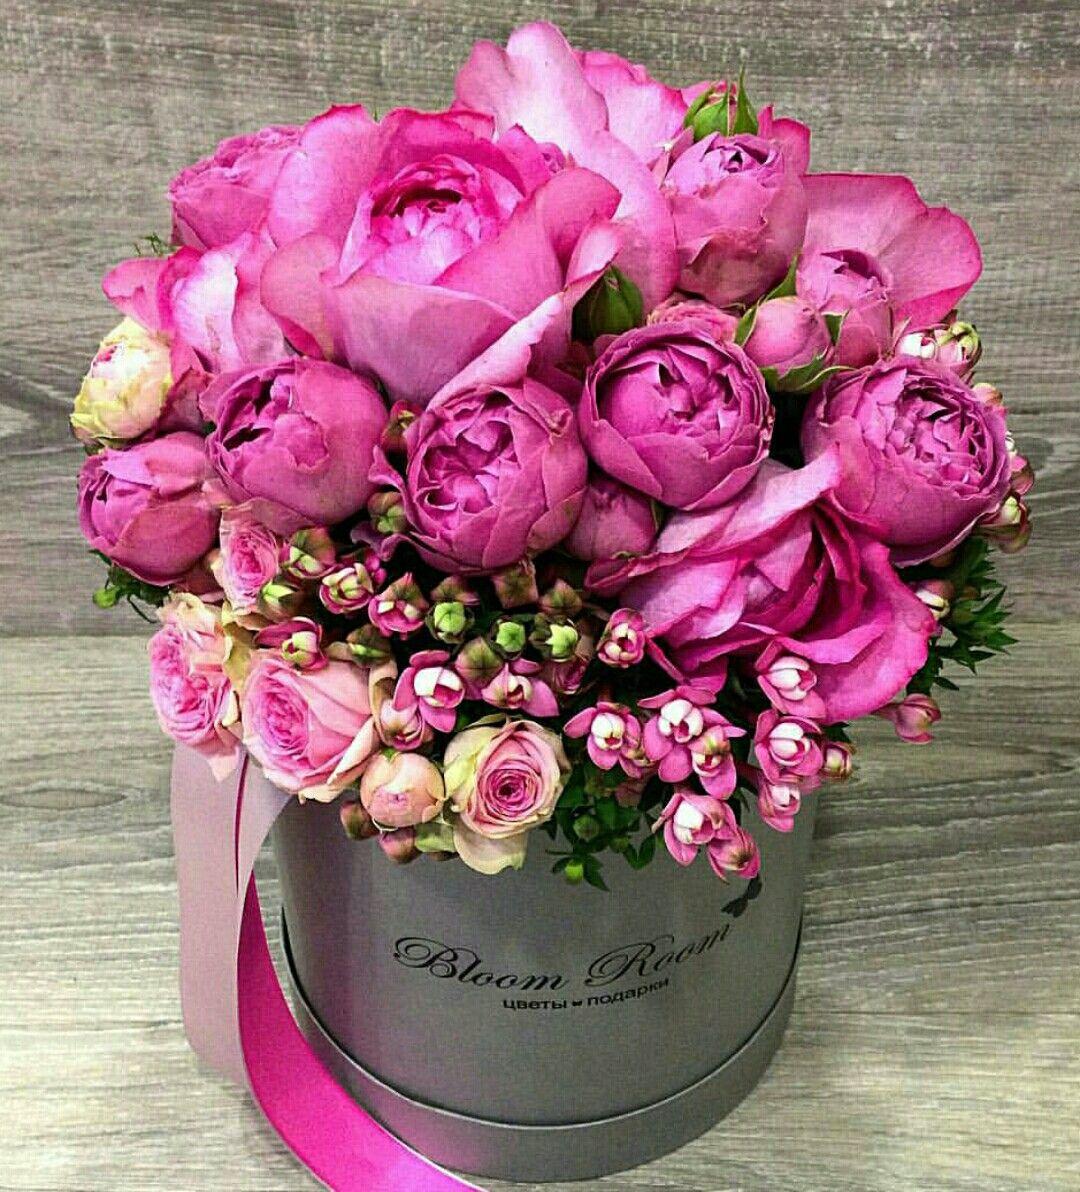 Good Morning Flower arrangements